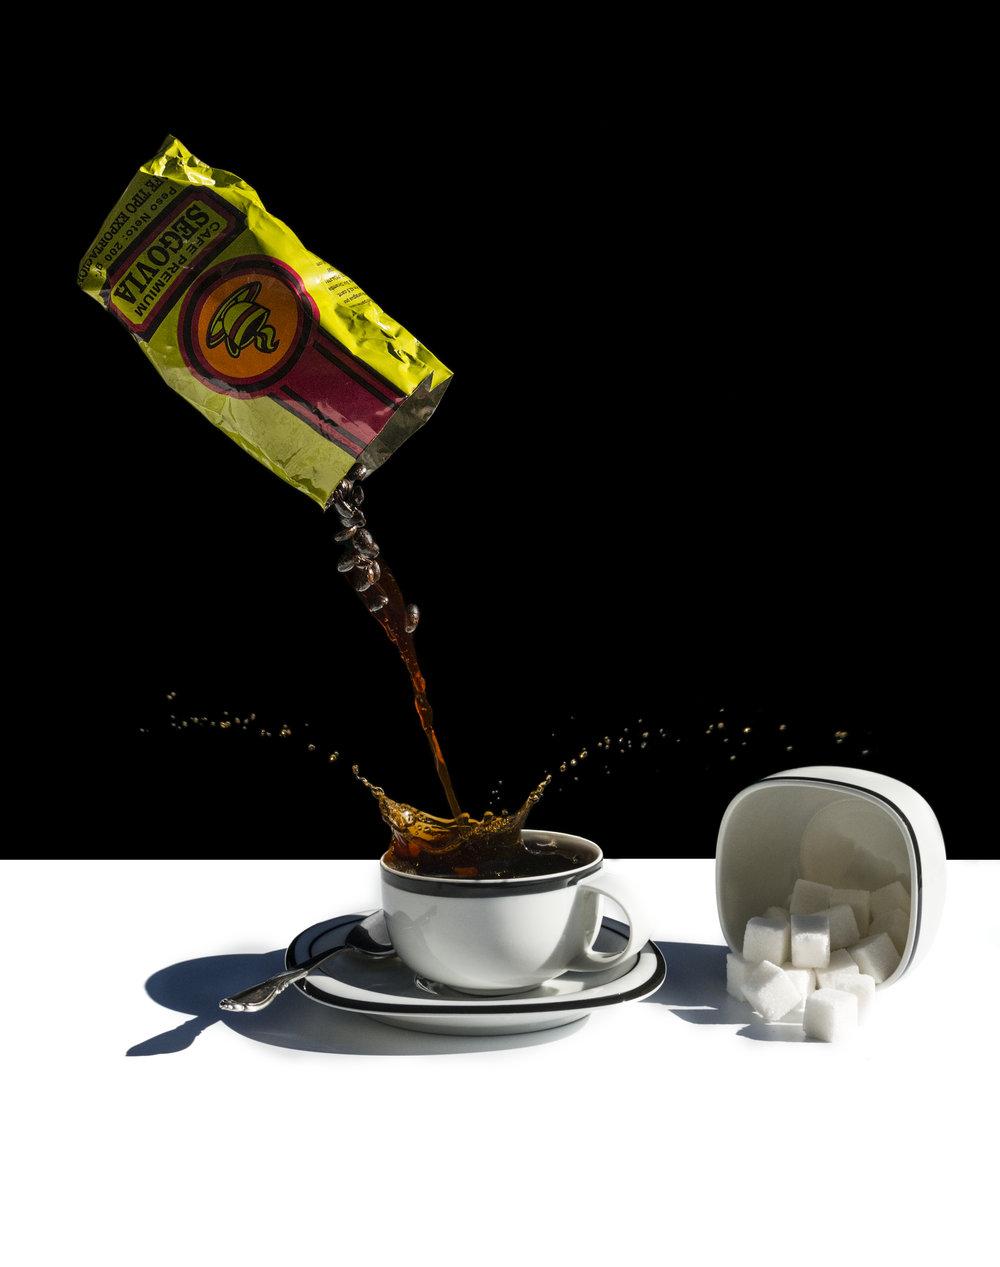 Morning Addiction